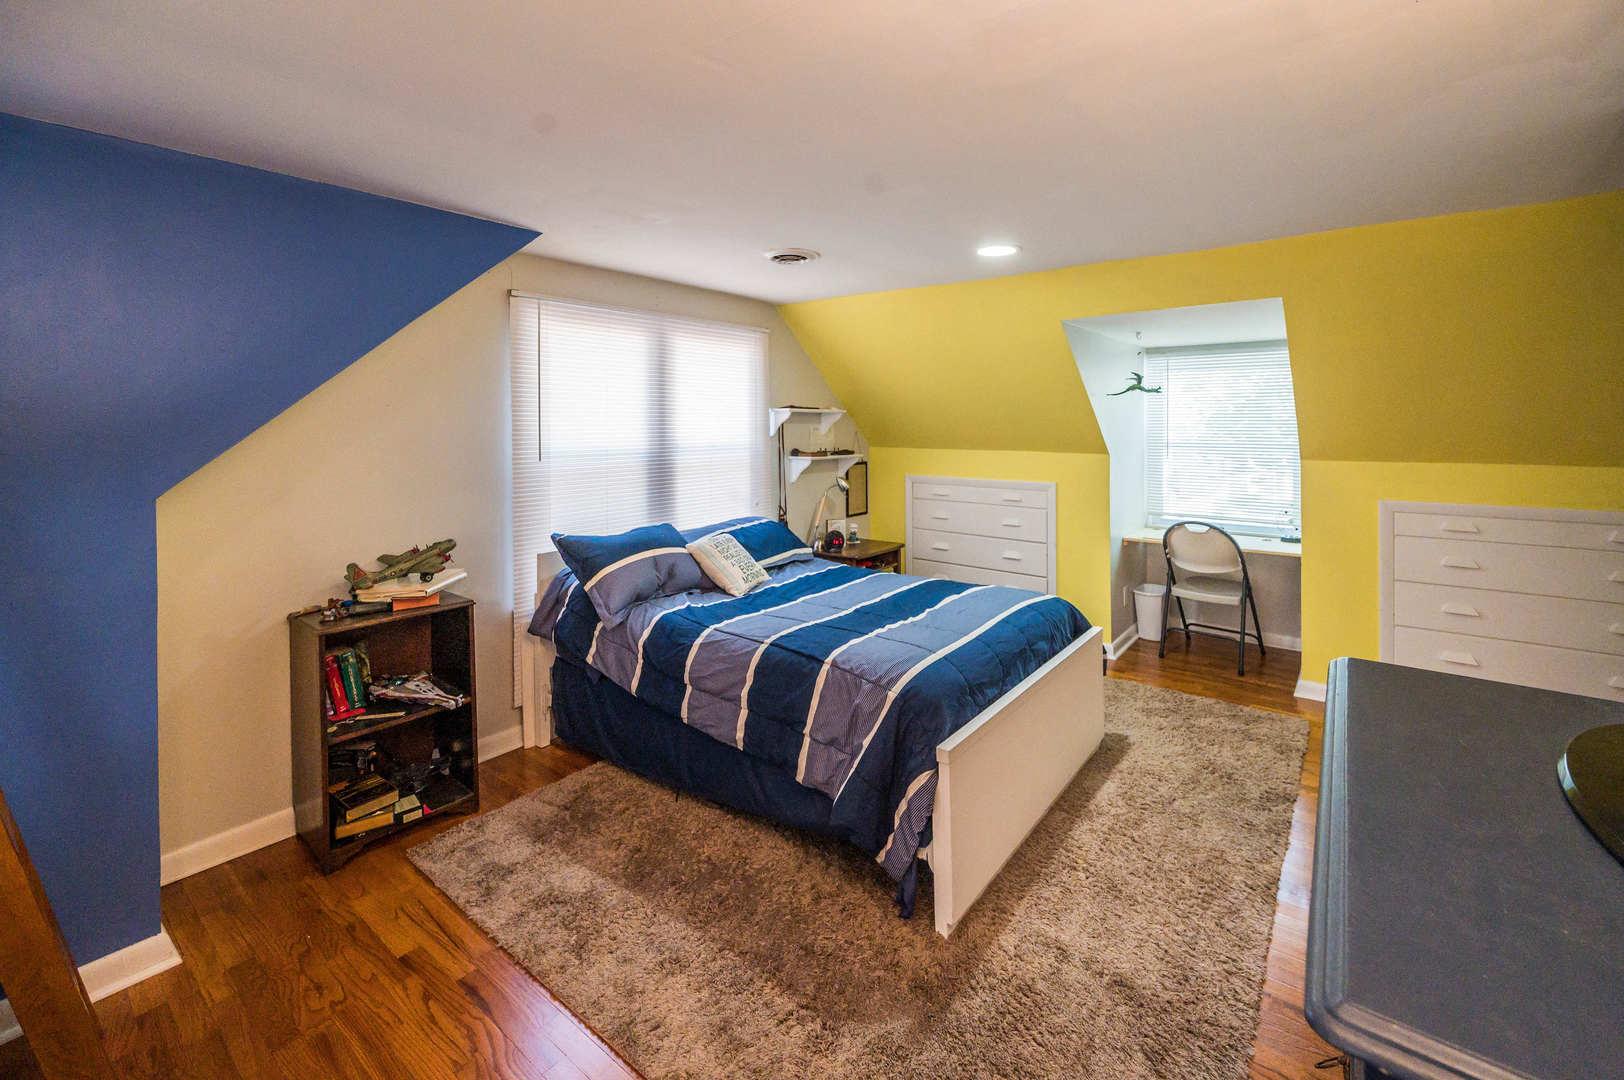 315 South Garfield, Champaign, Illinois, 61821